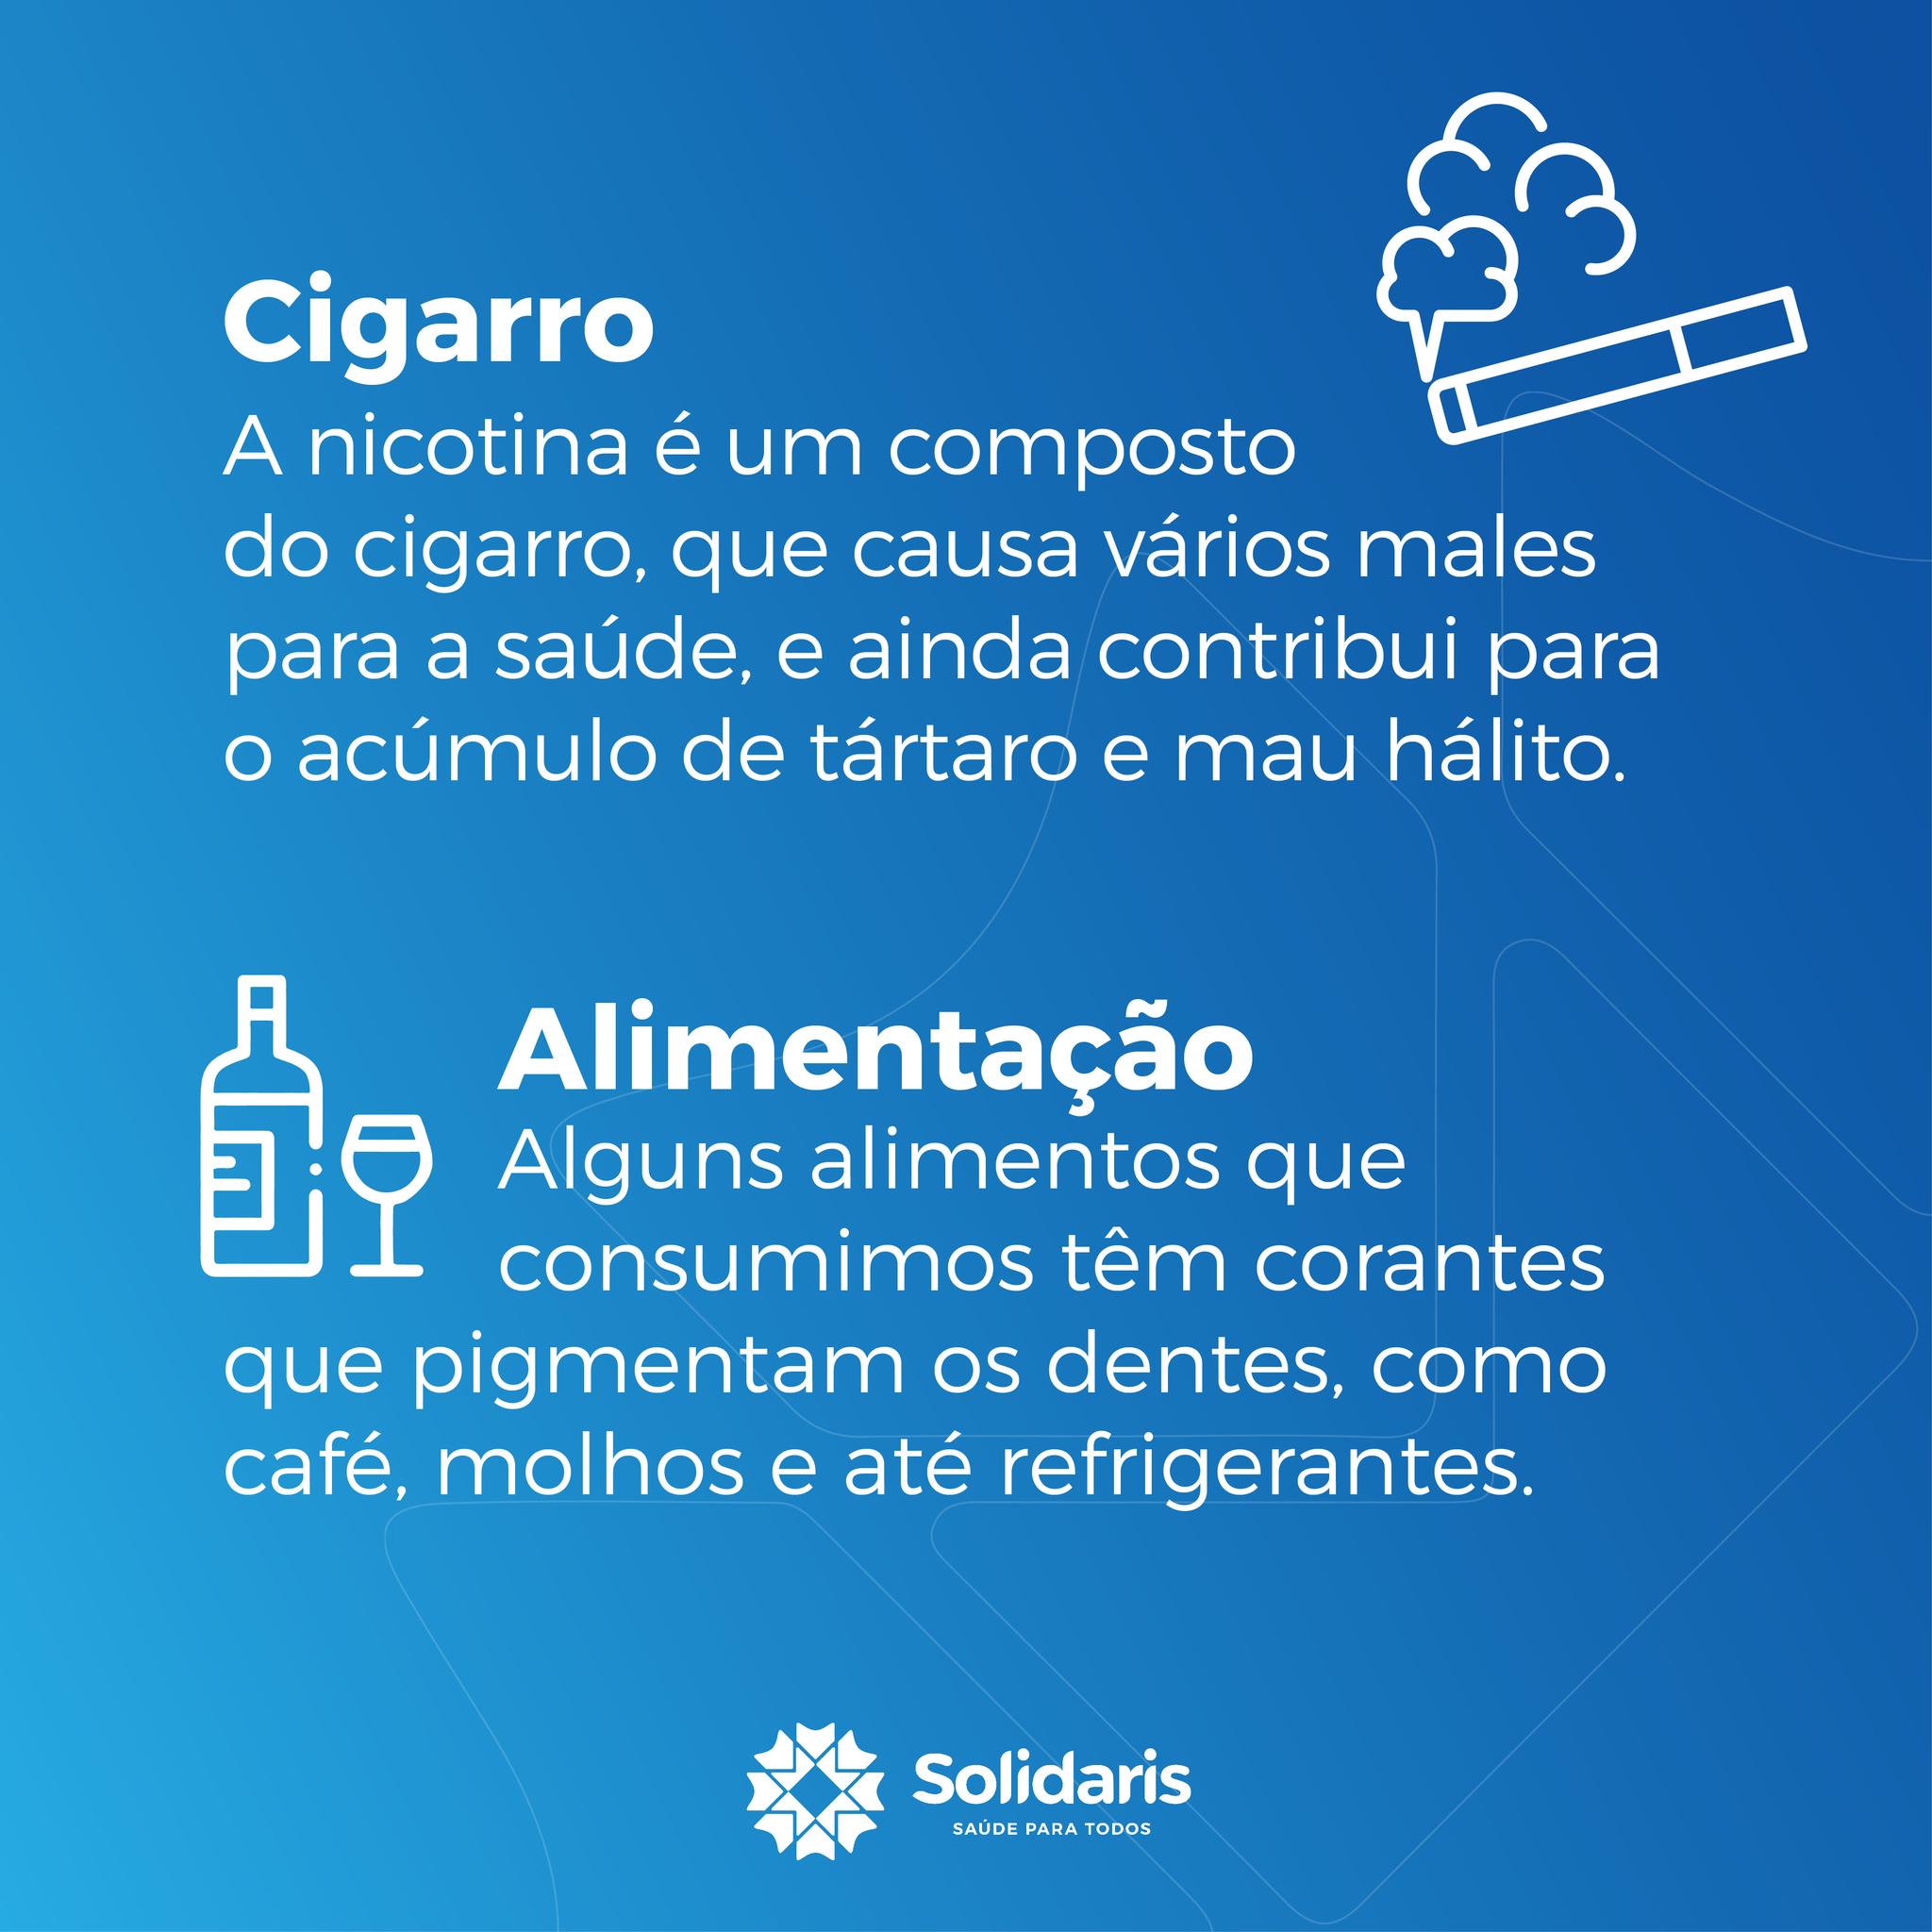 CONSULTÓRIO DENTÁRIO NA AVENIDA MERITI - RJ